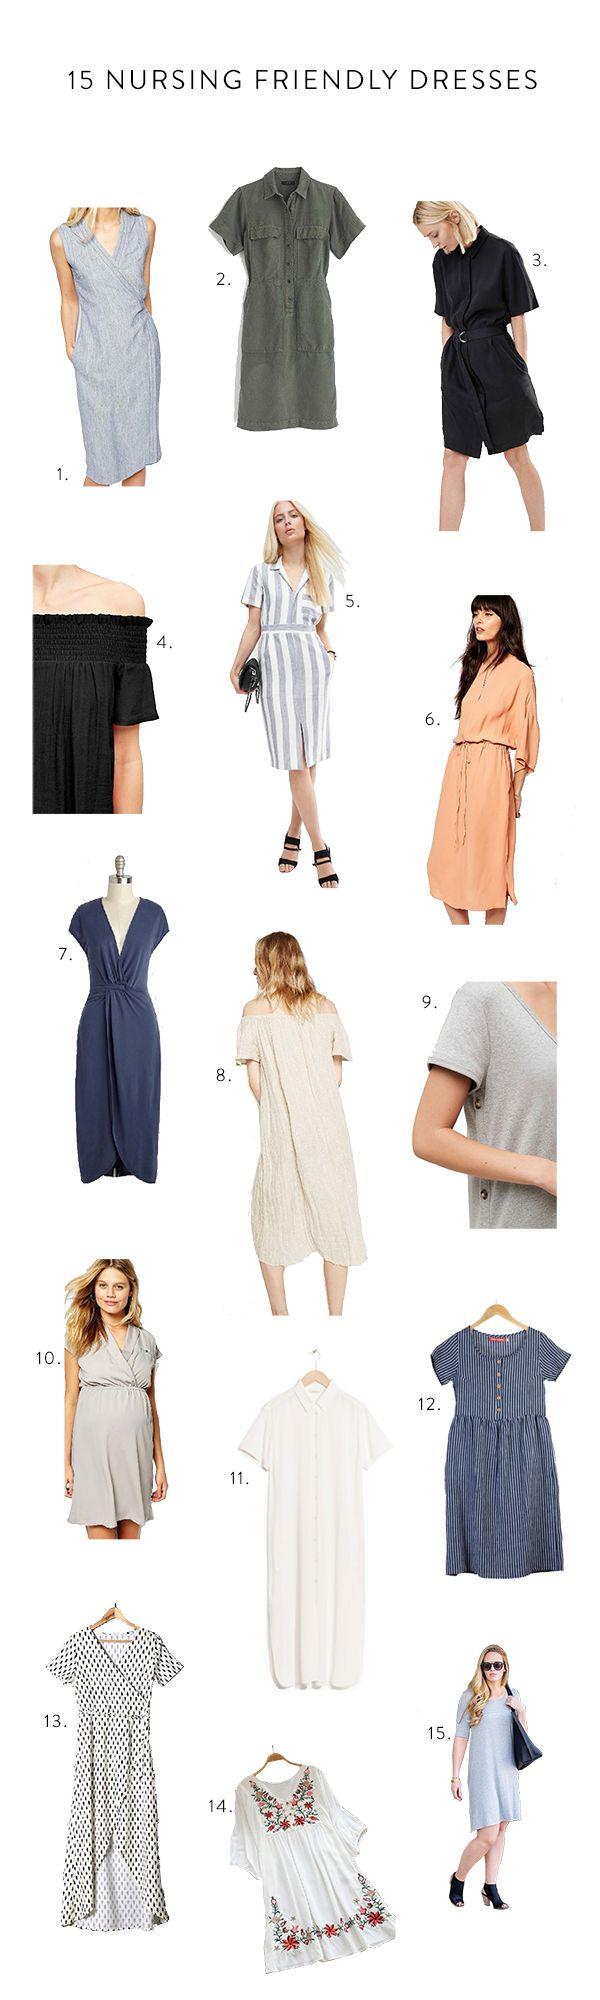 15 Nursing Friendly Dresses